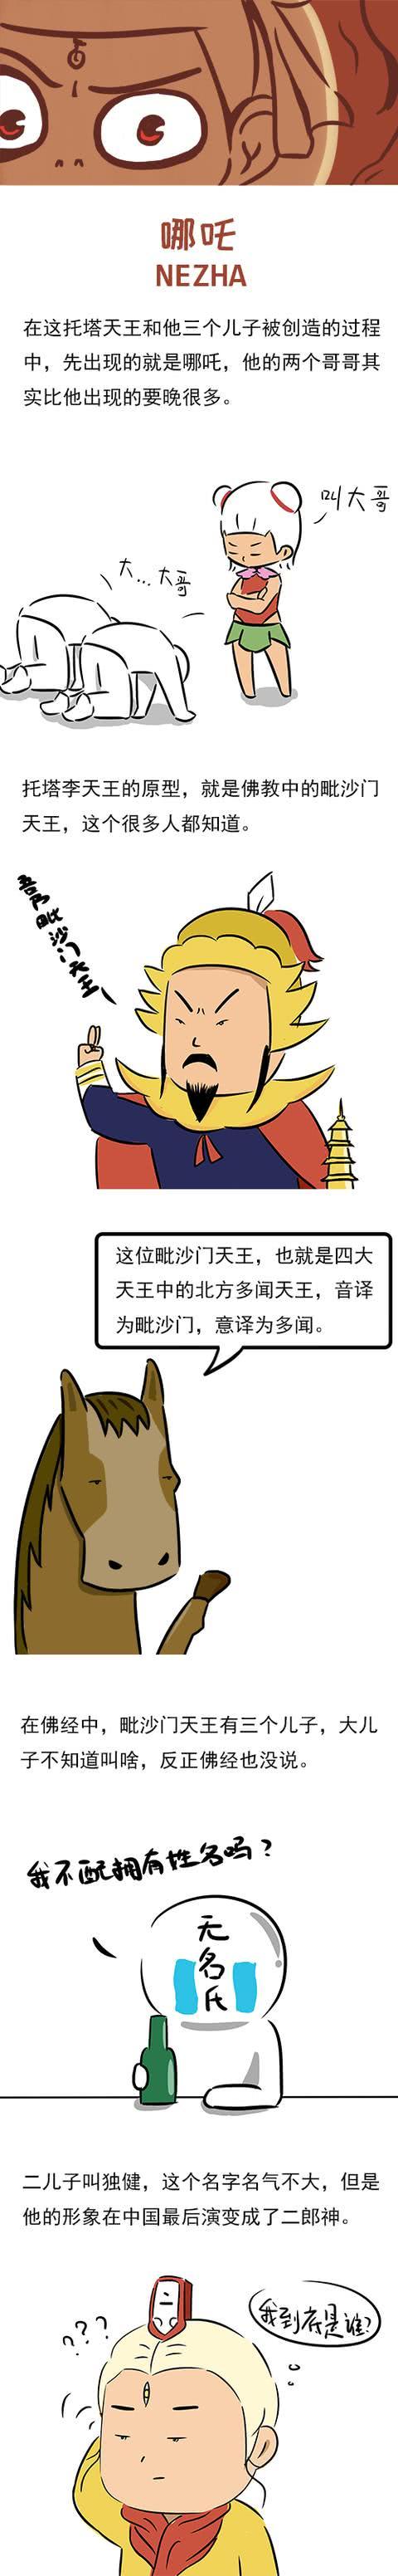 <b>李靖3个儿子:哪吒成名最早,金吒、木吒名字的由来让人哭笑不得</b>